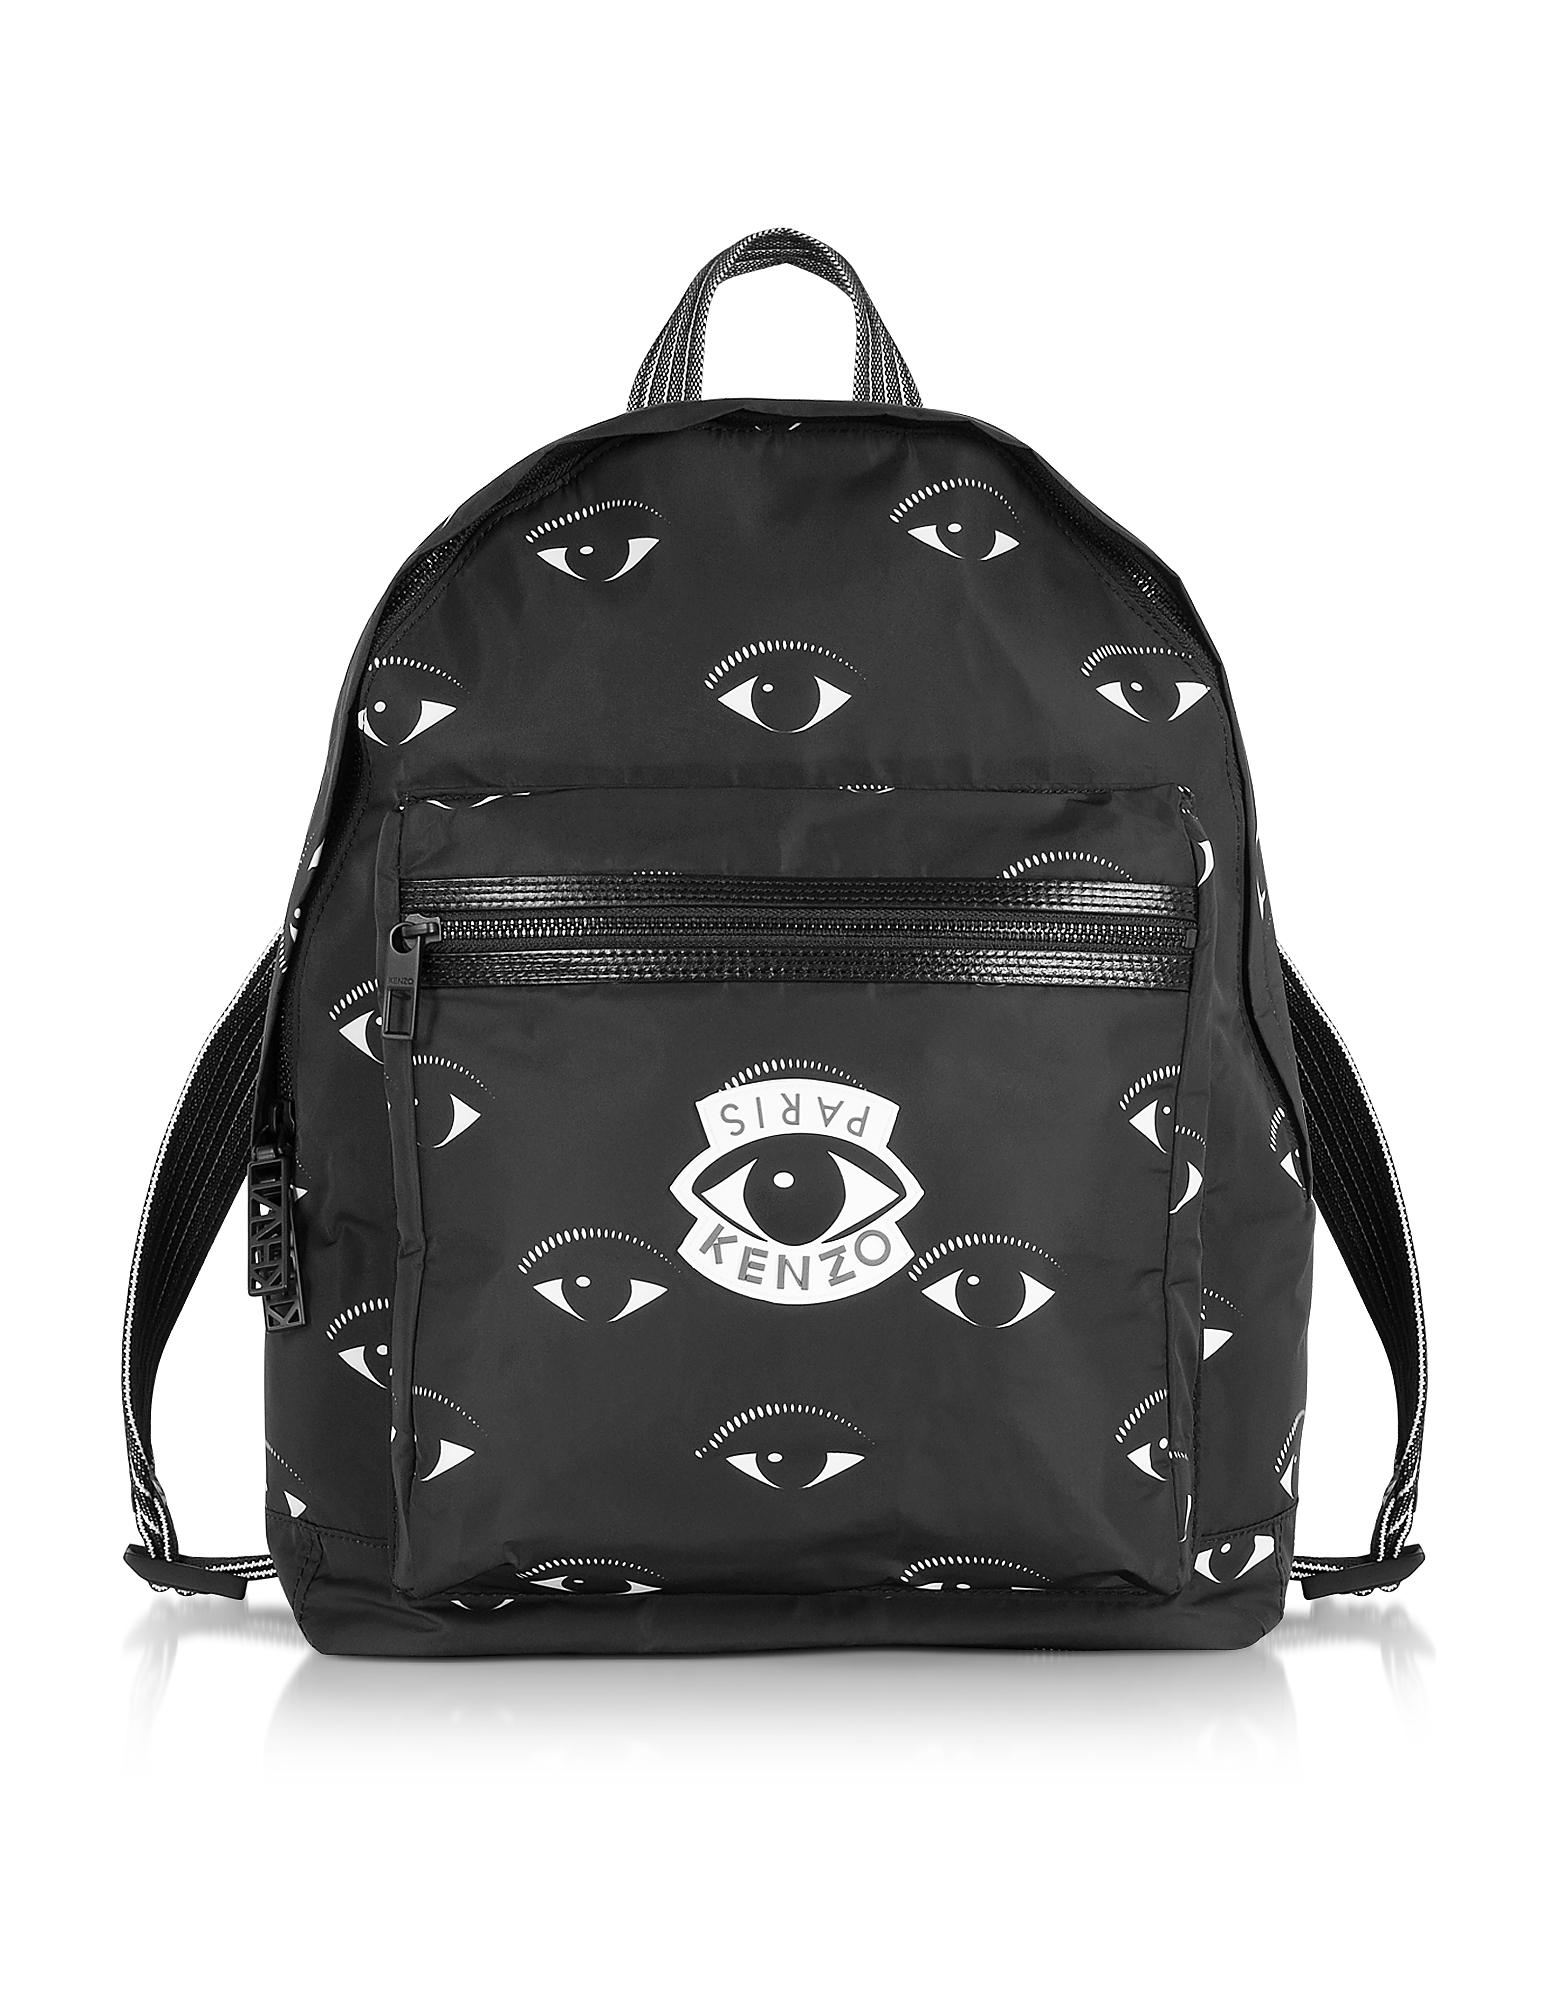 Kenzo Handbags, Black Fabric Multi Eye Backpack